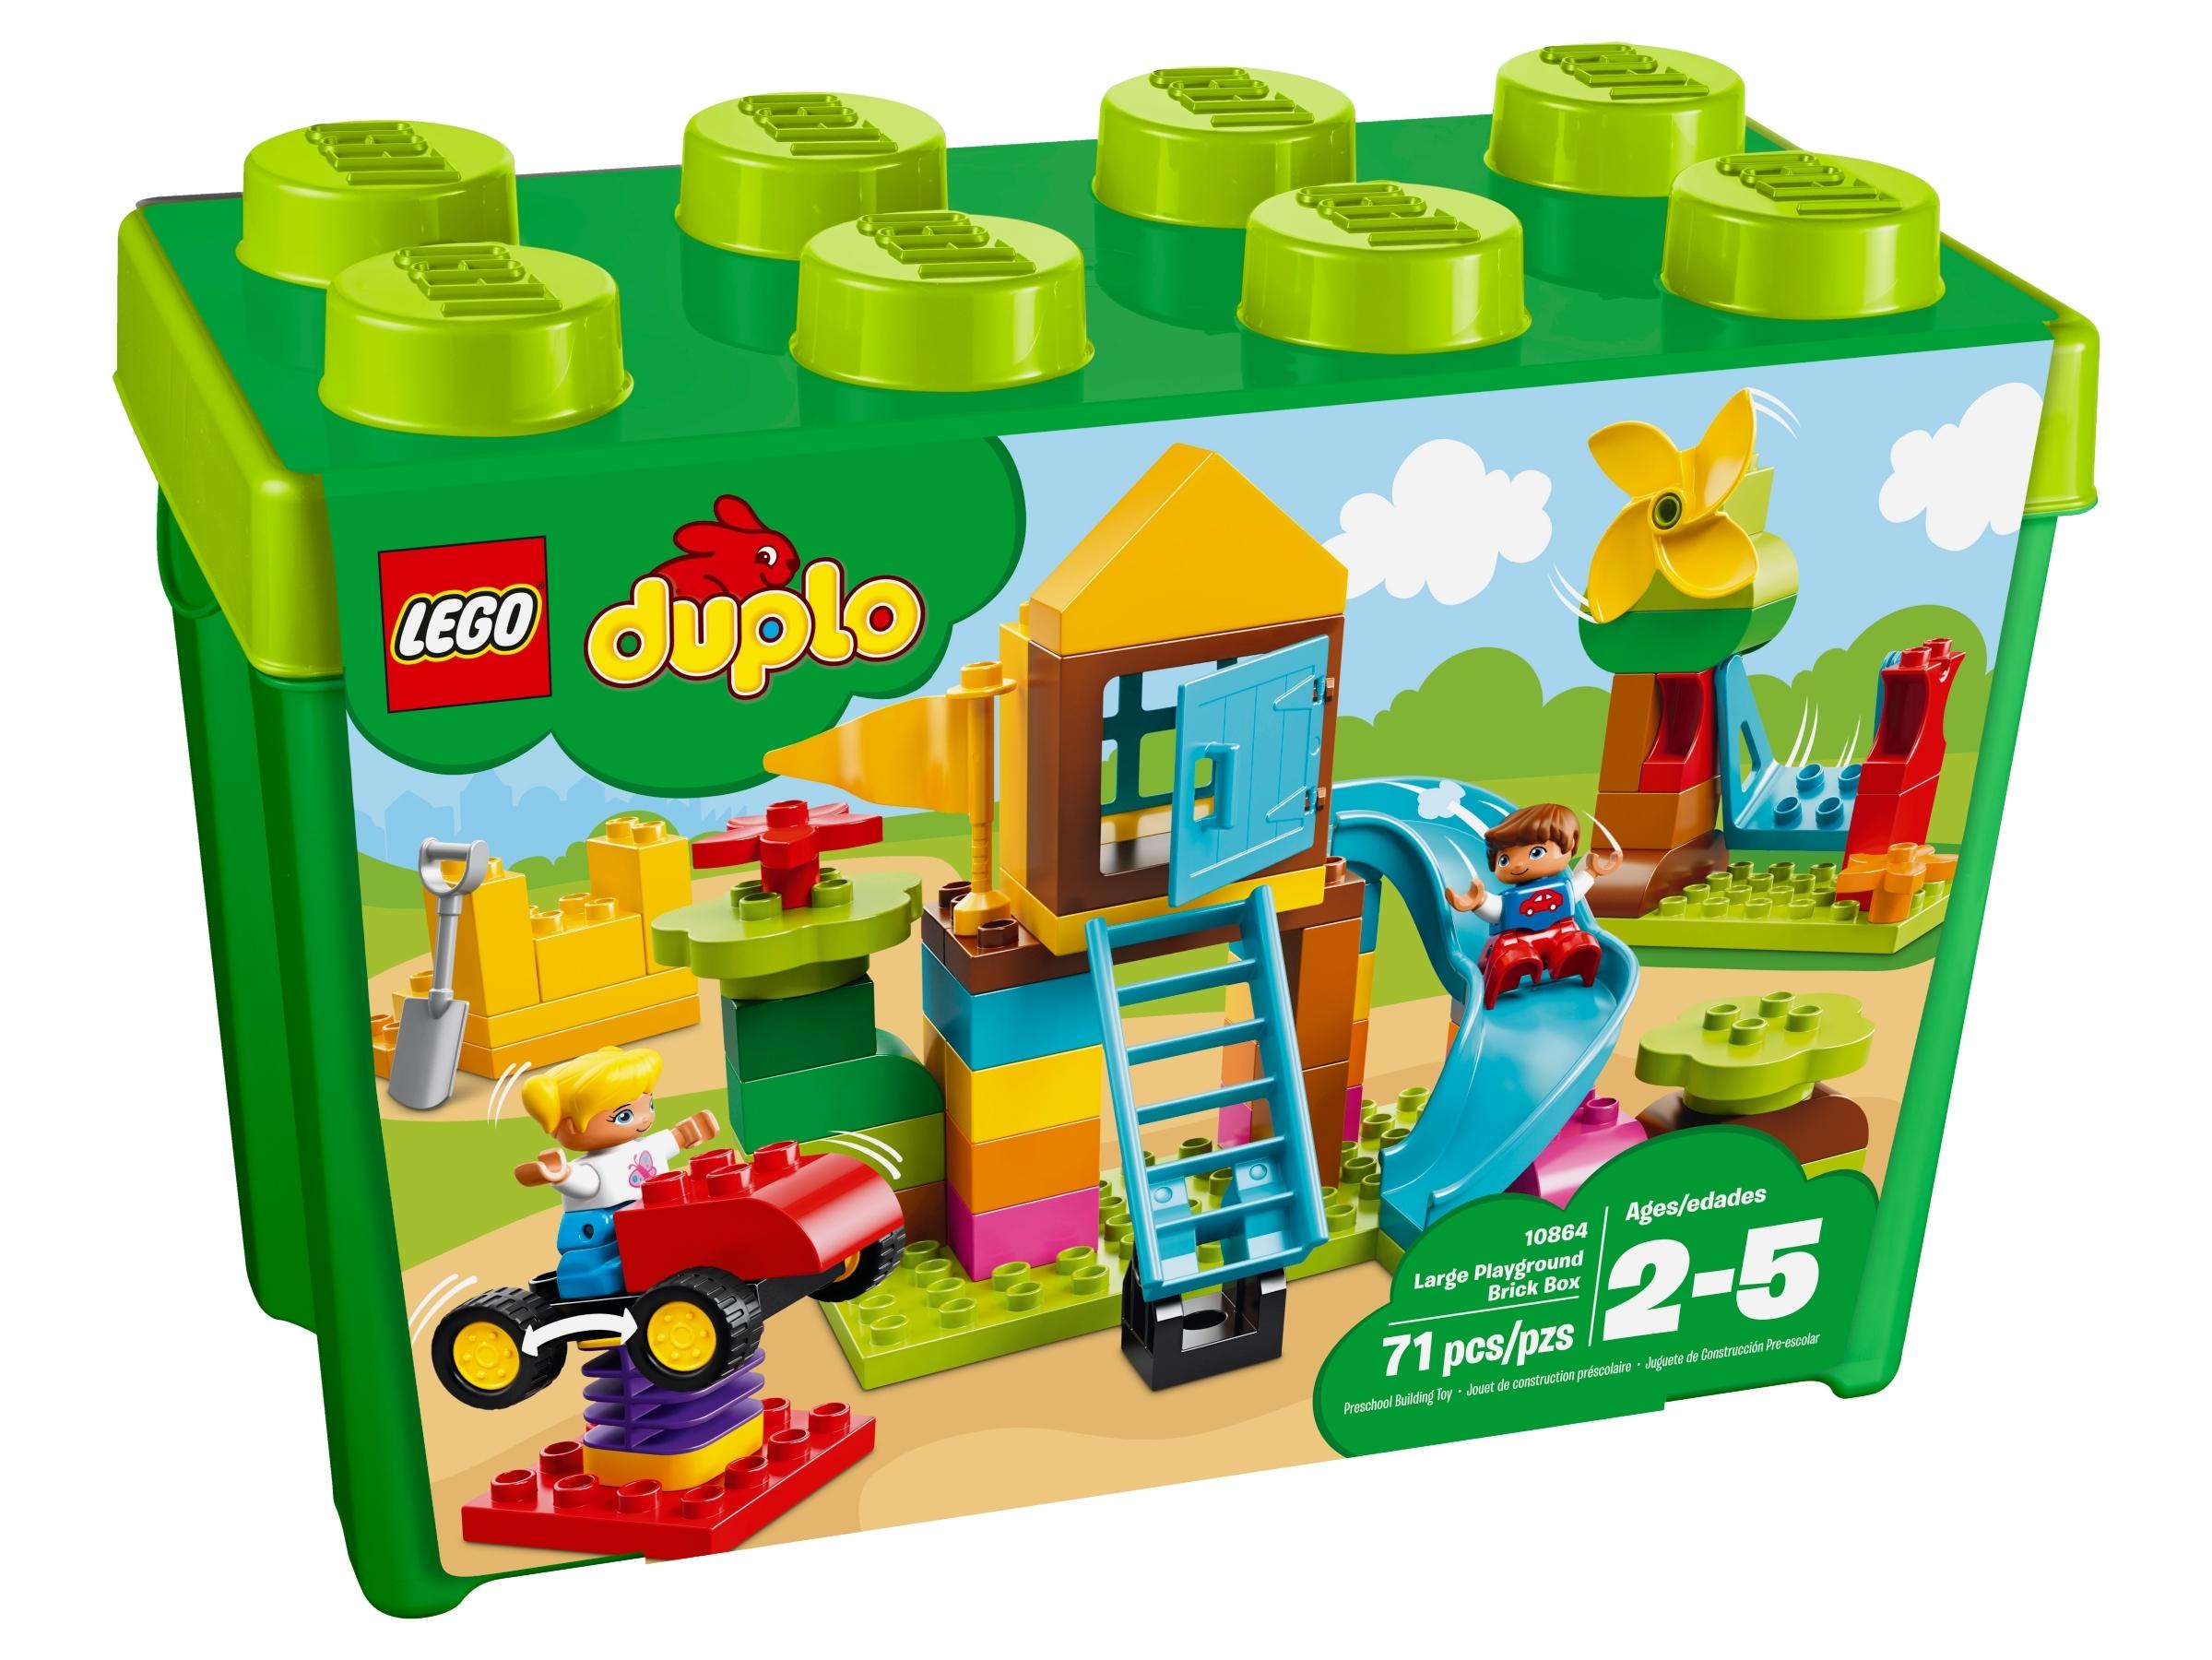 Large Playground Brick Box 10864   DUPLO®   Buy online at the ...